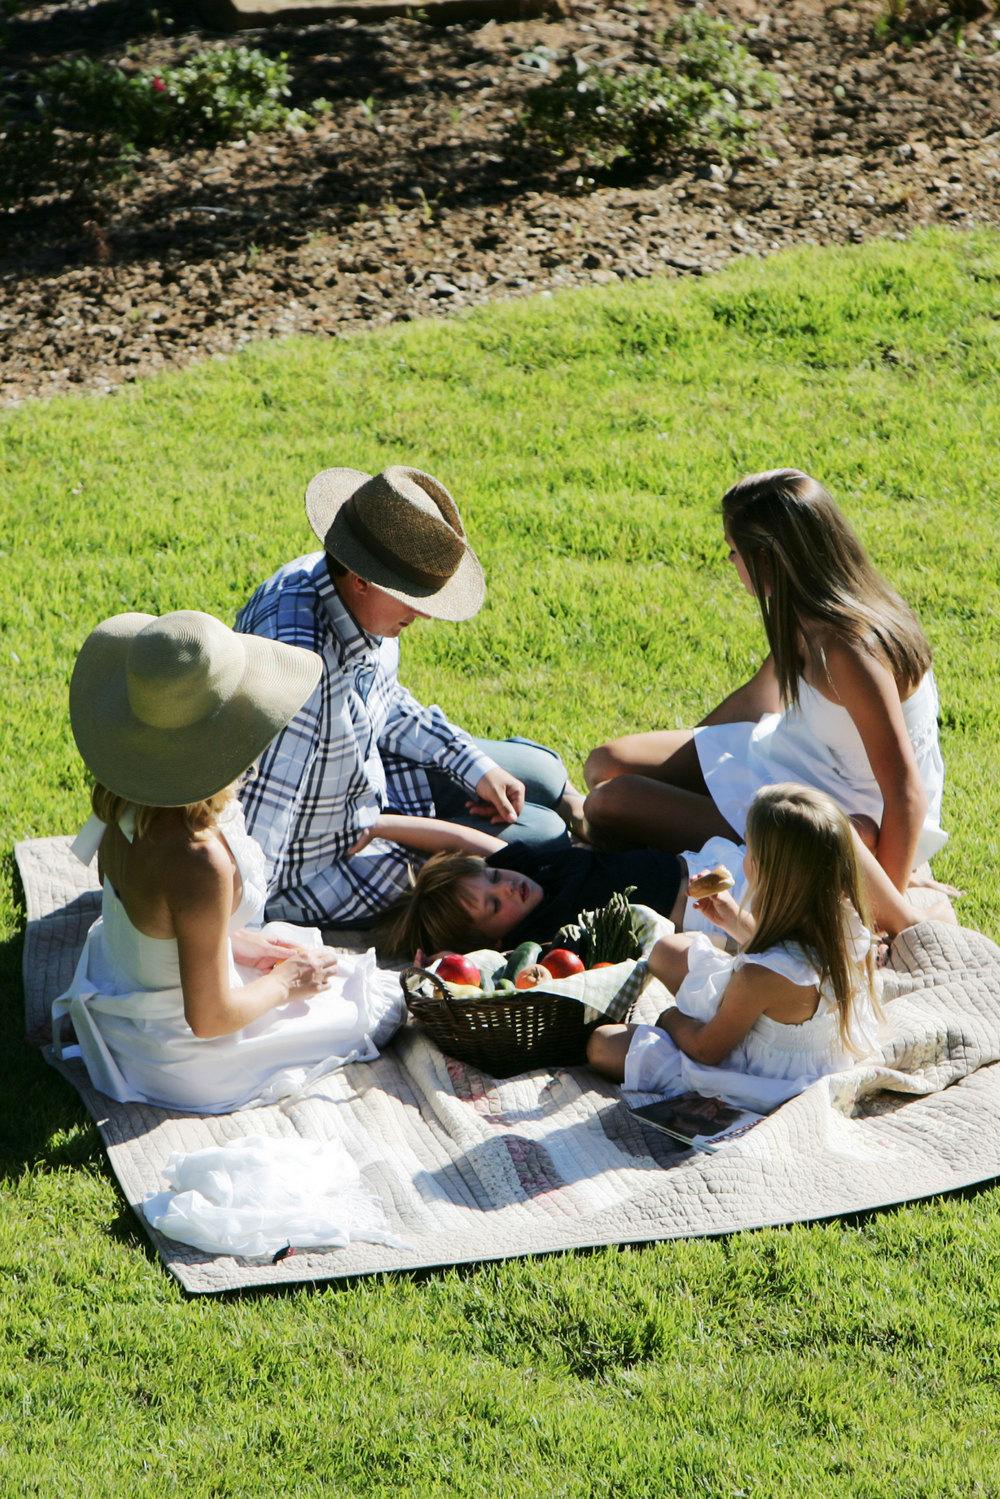 Gorecki family picnic